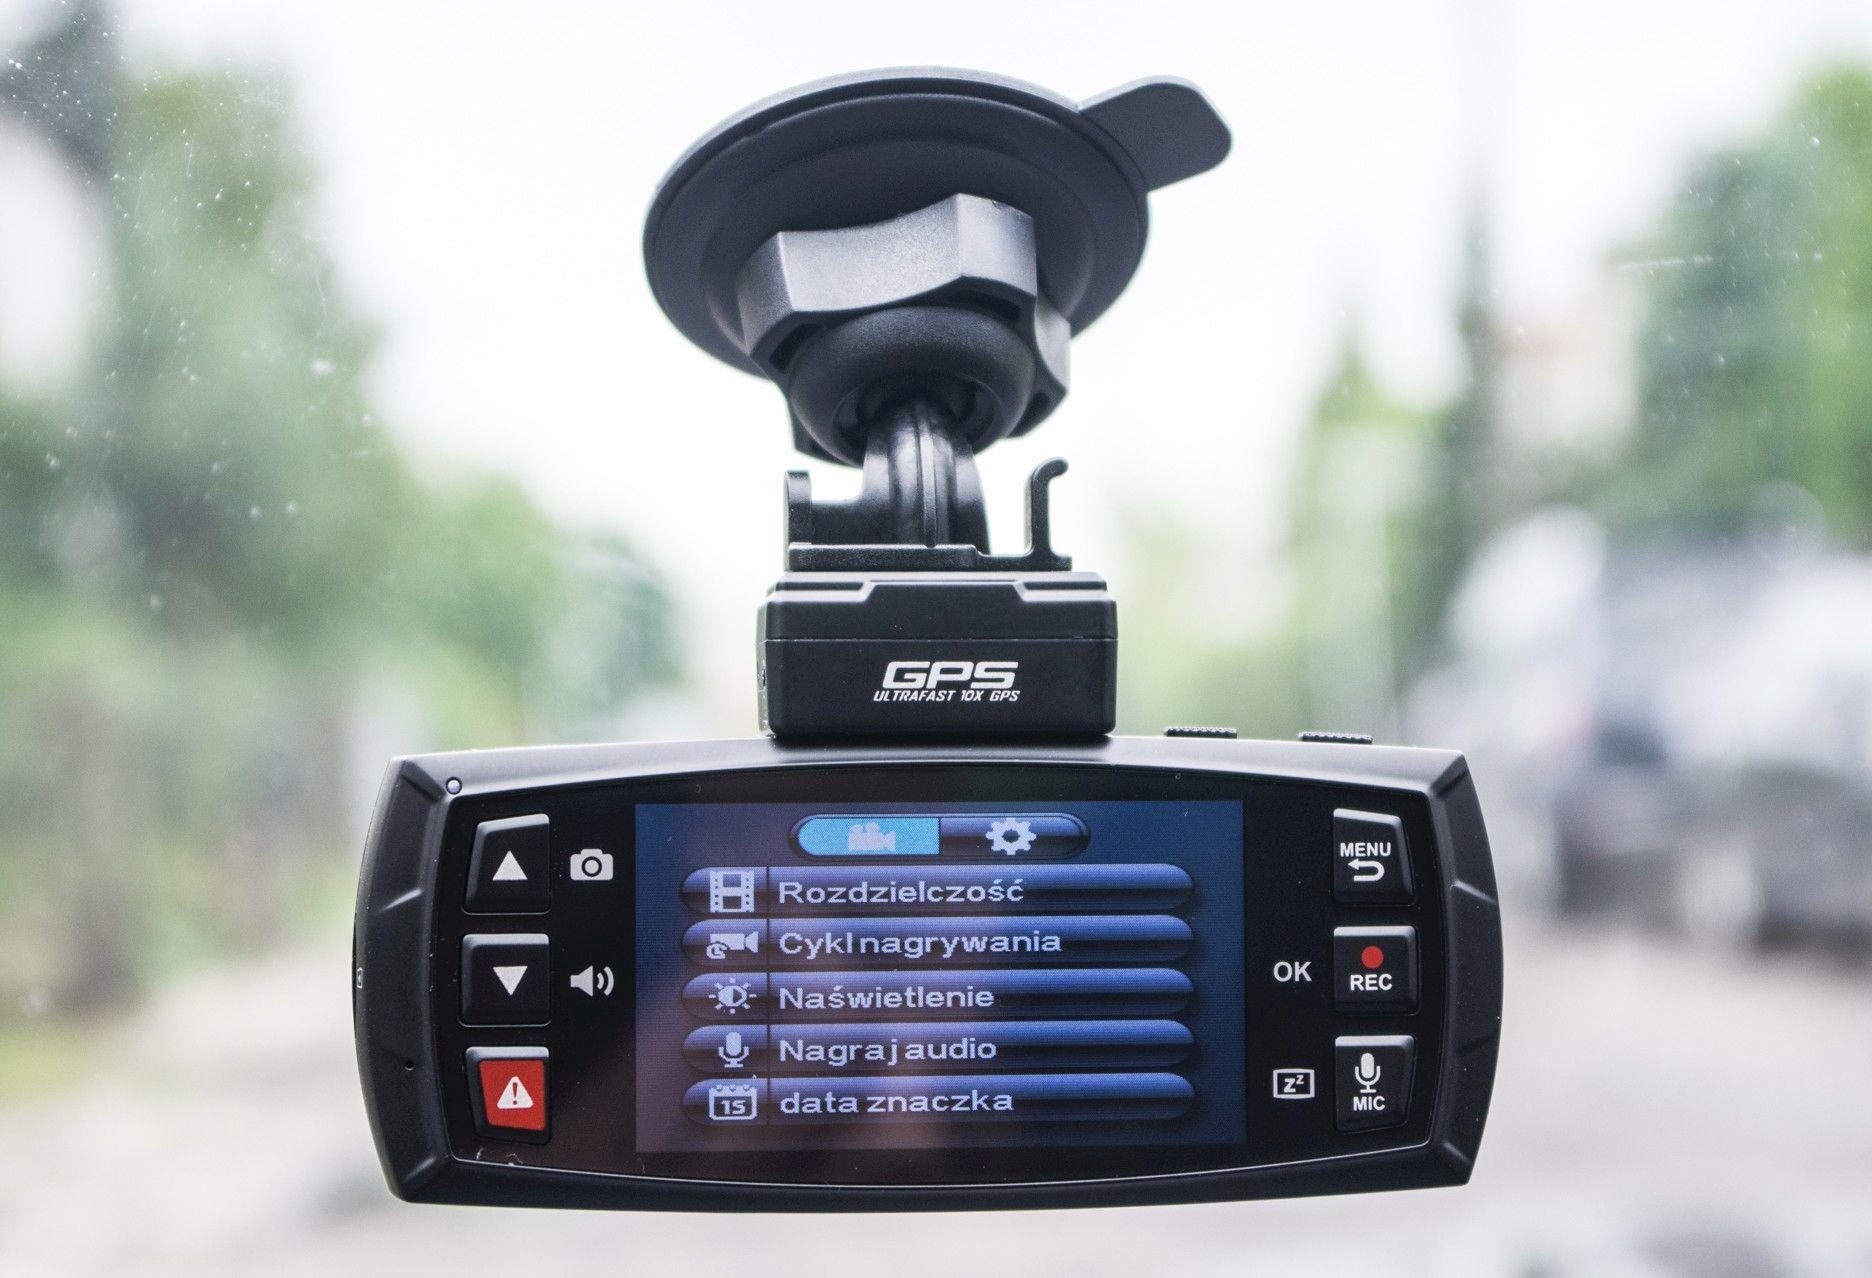 DOD LS470W GPS - menu_1